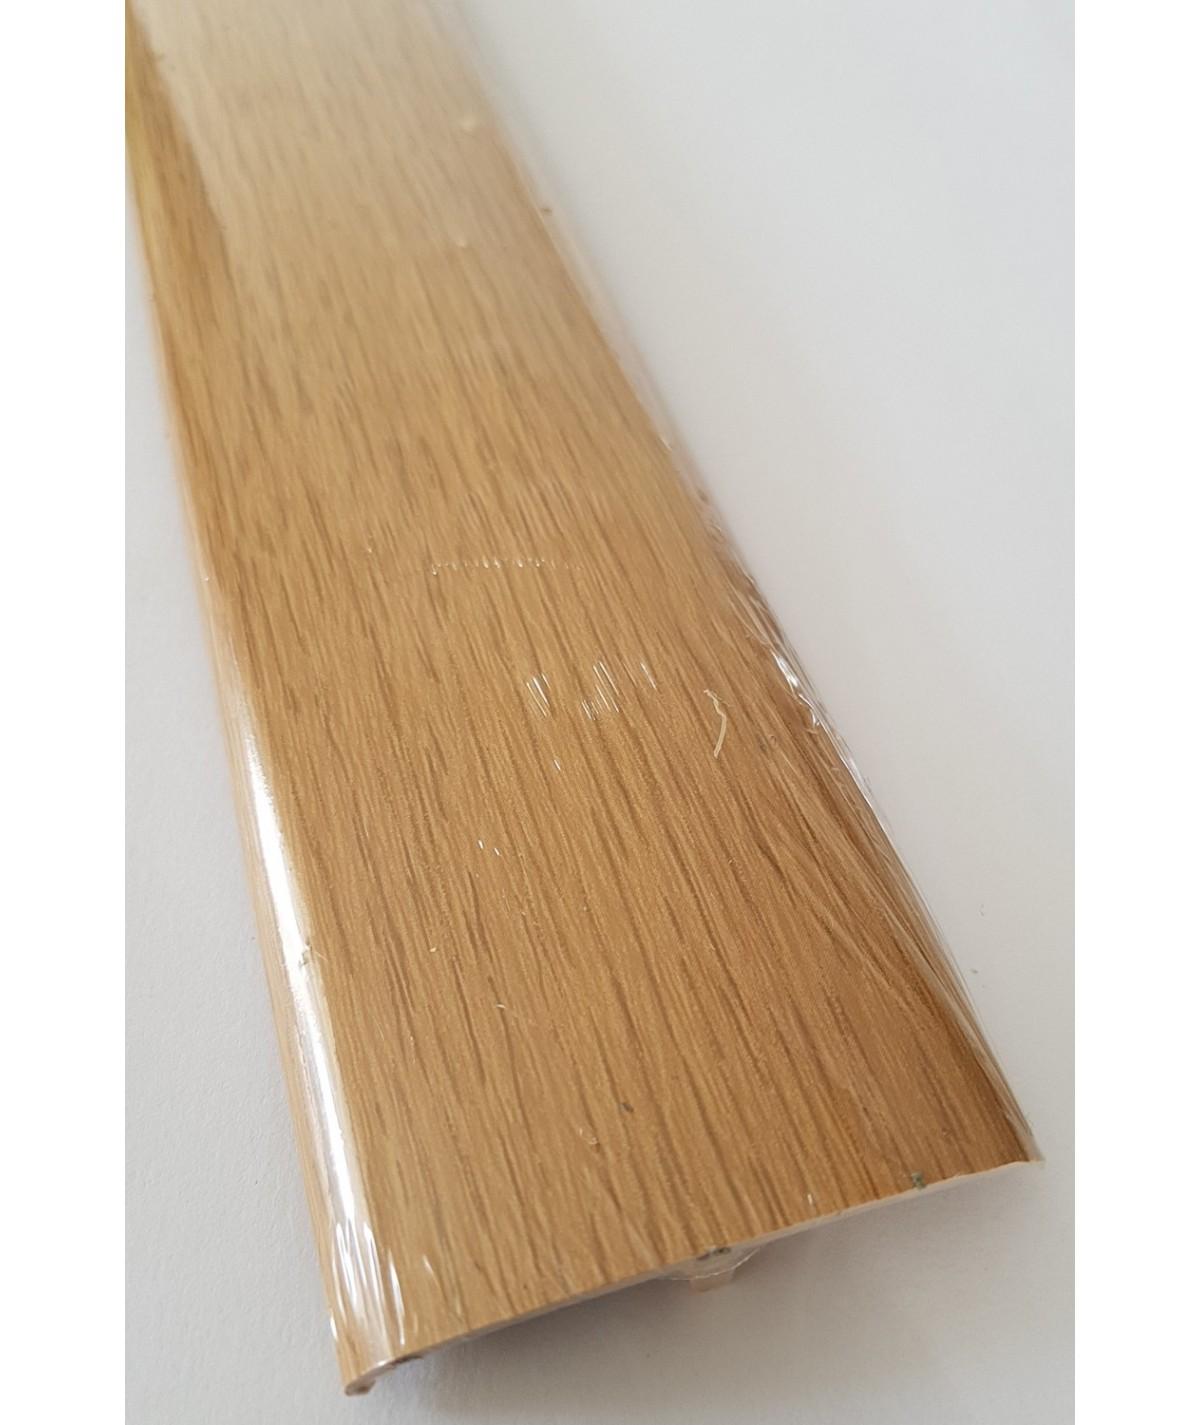 Light Oak Laminated Transition Threshold Strip 50mm x 90cm Multi-Height/Pivots